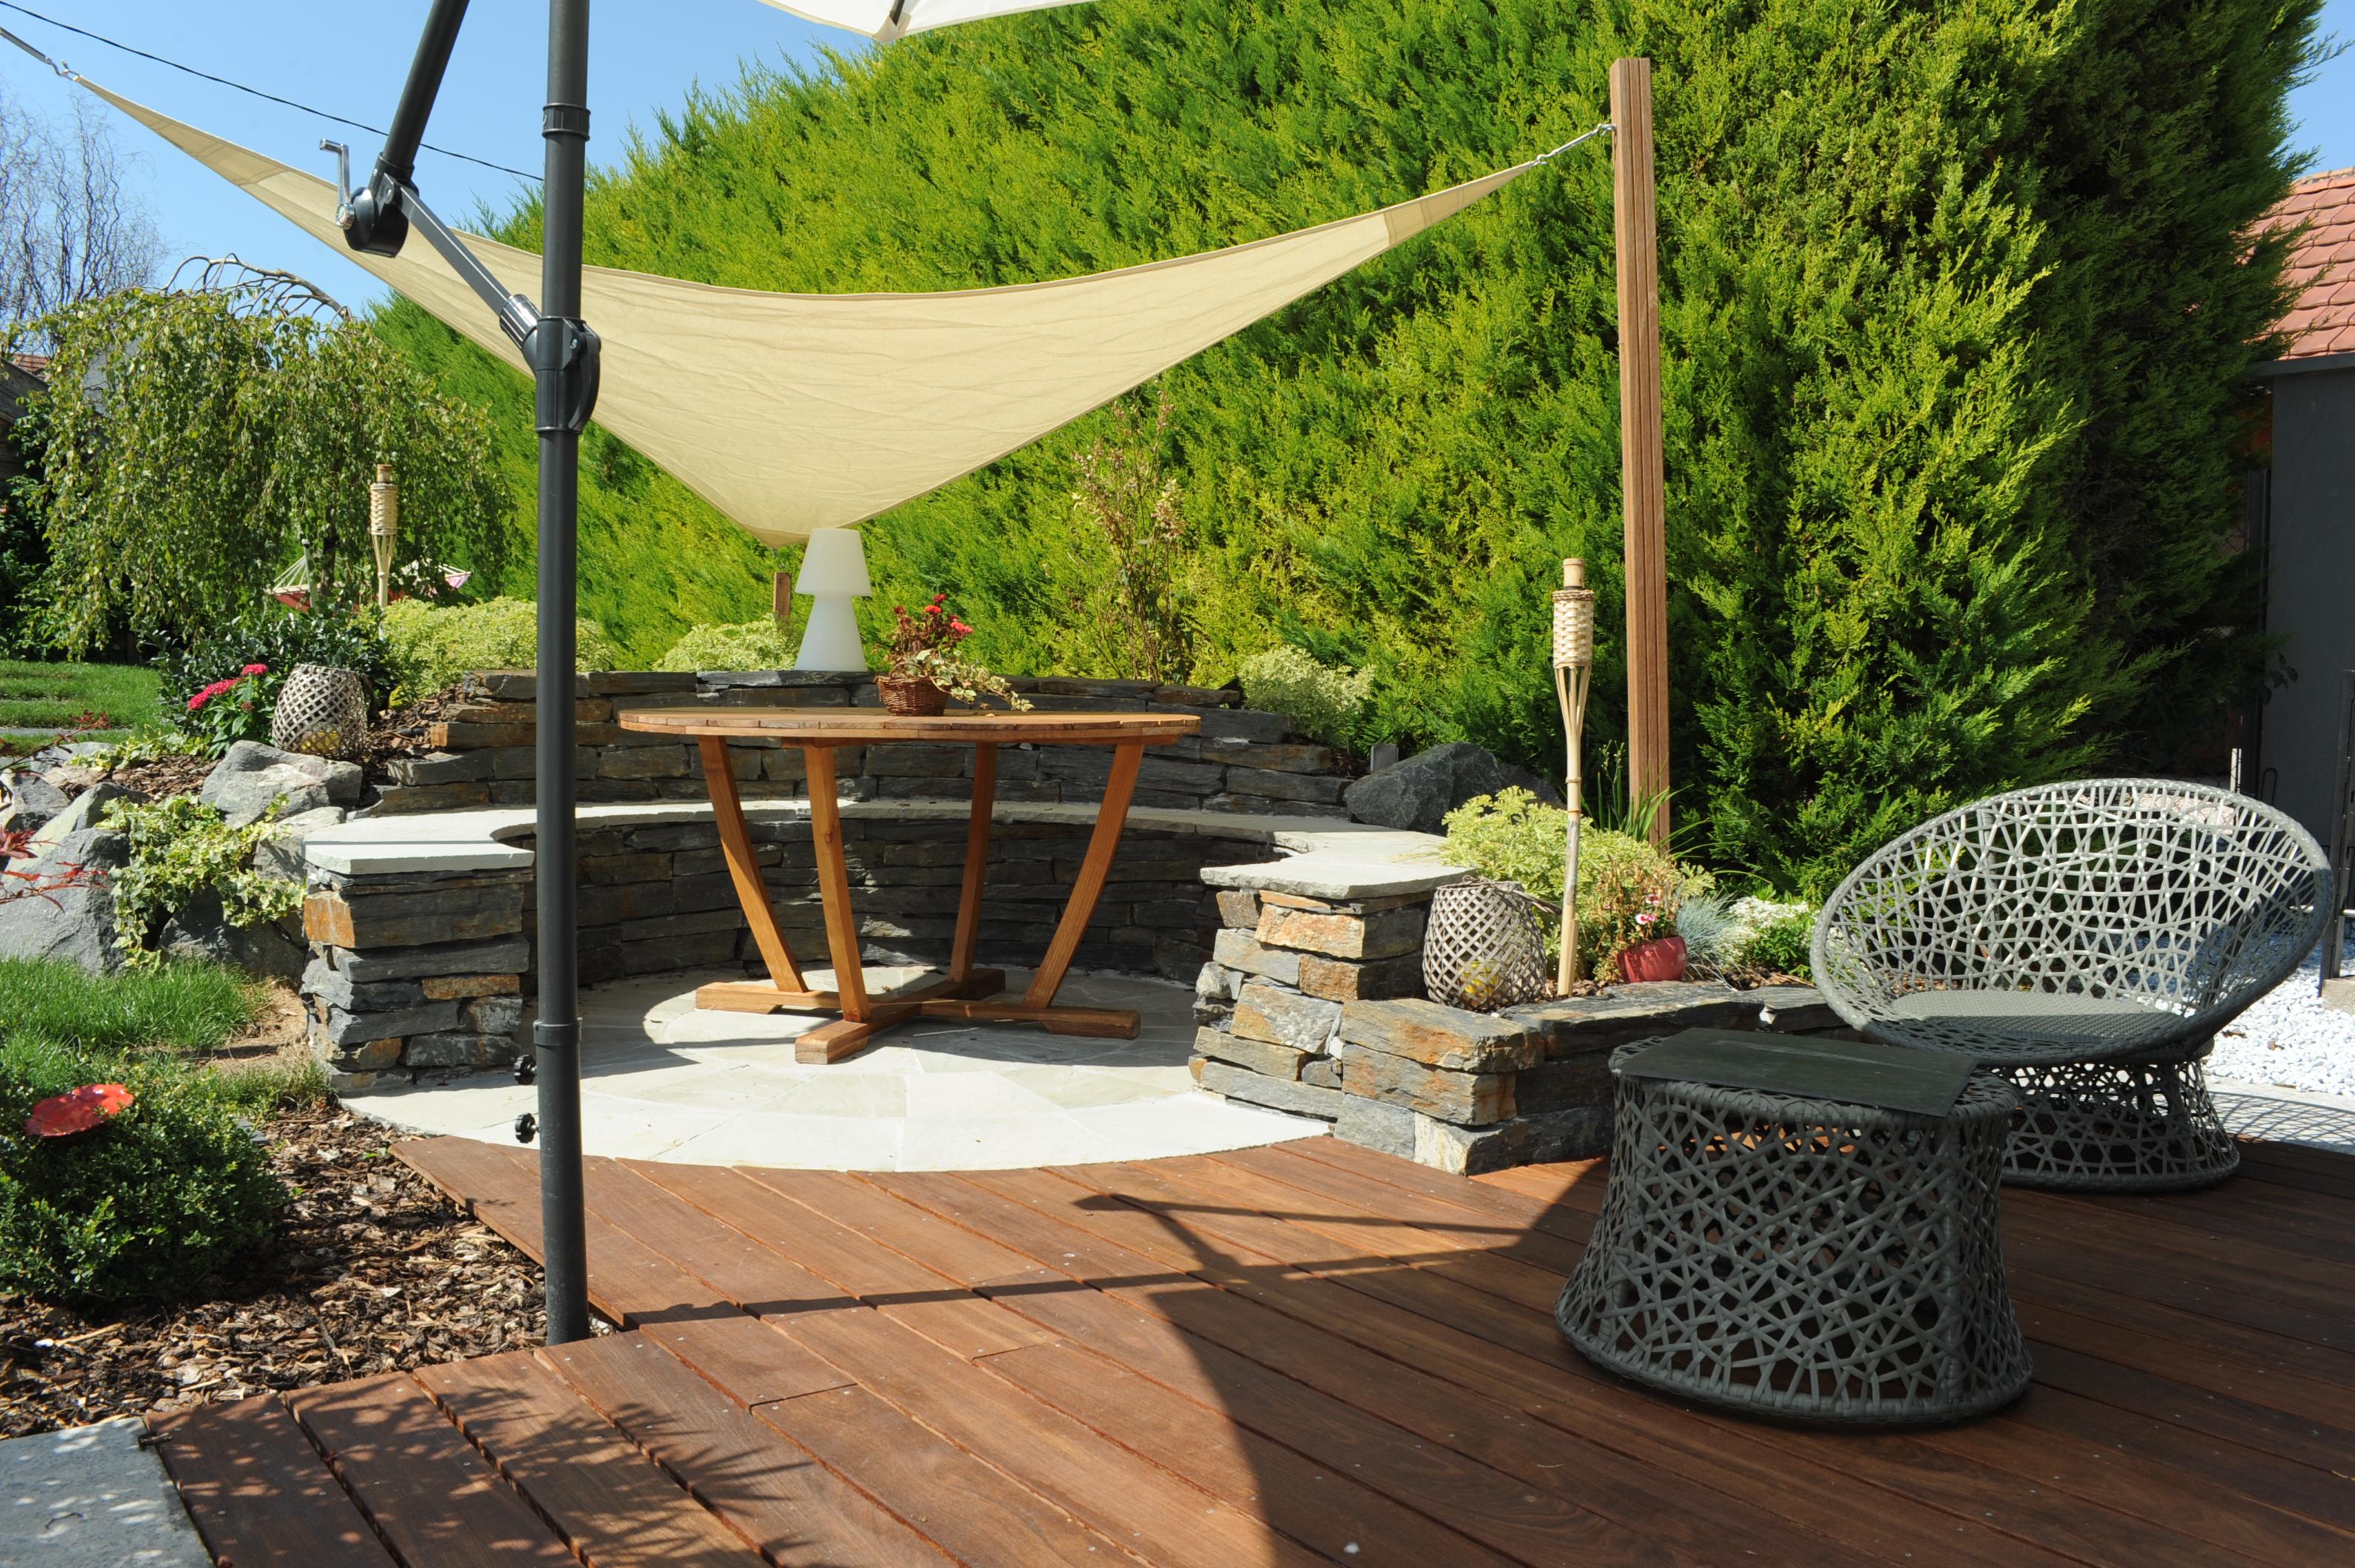 activit s de jardin tom pousse paysage. Black Bedroom Furniture Sets. Home Design Ideas